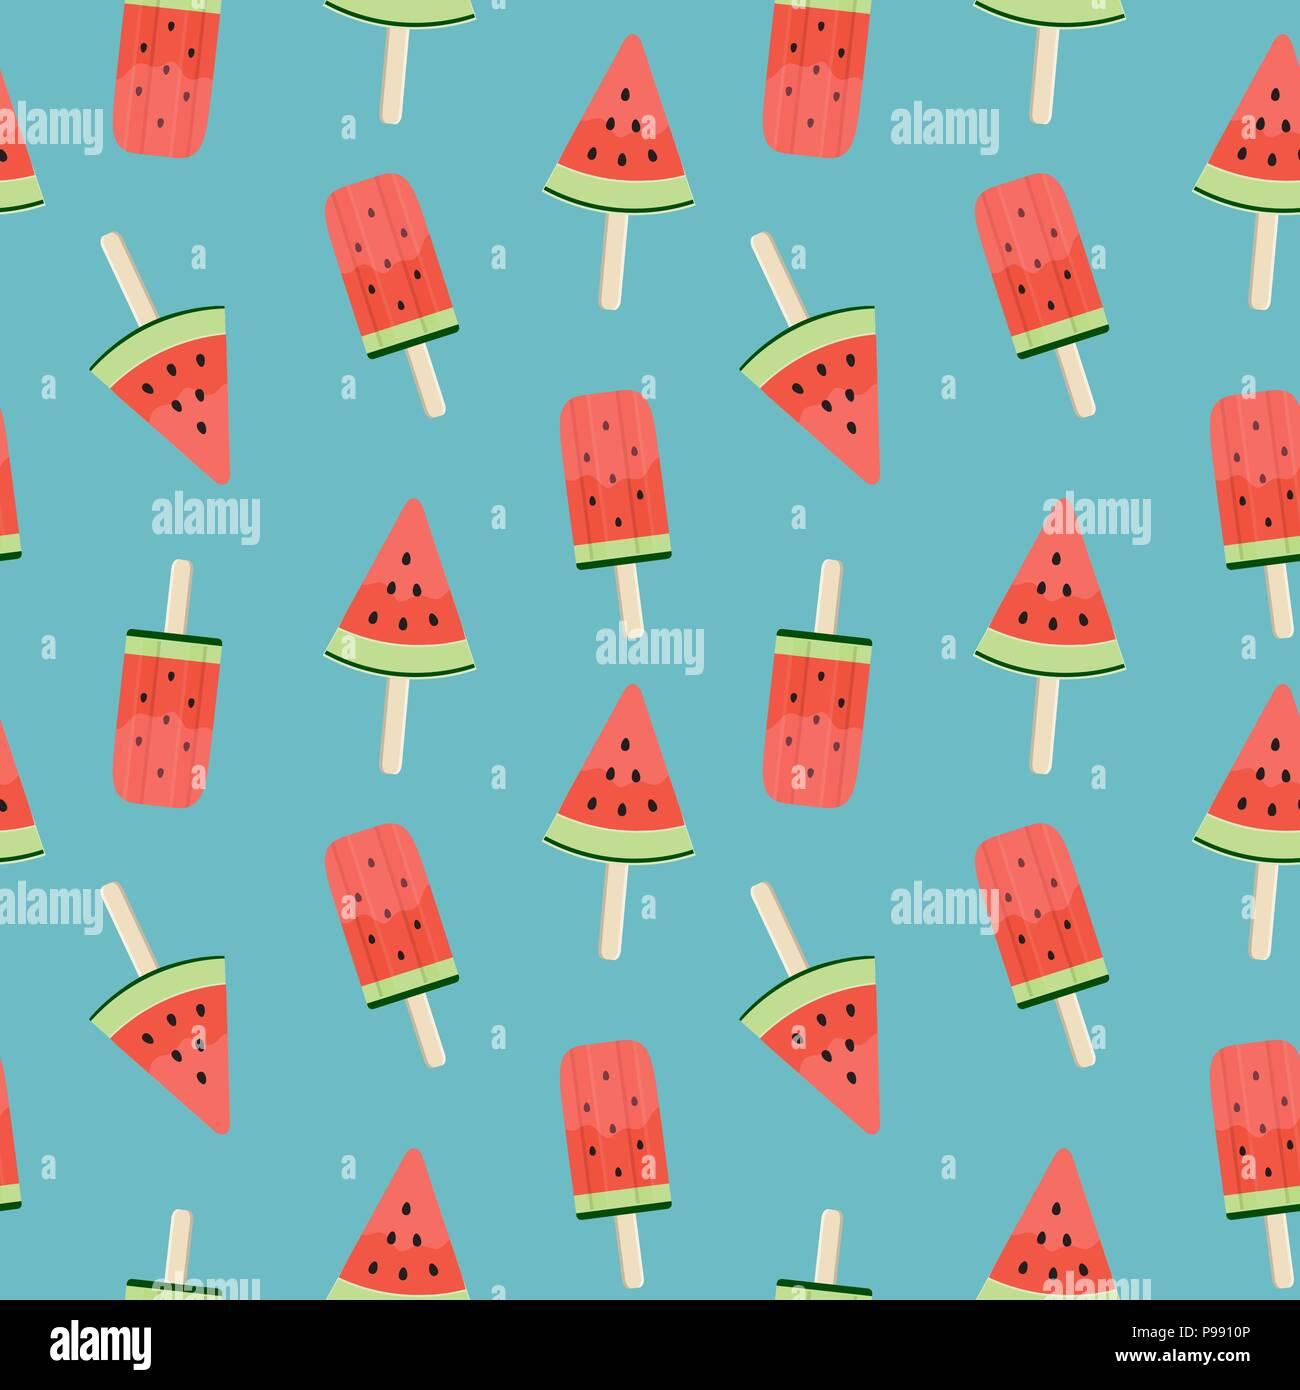 Watermelon Ice Cream Seamless Pattern Background Vector Illustration Stock Vector